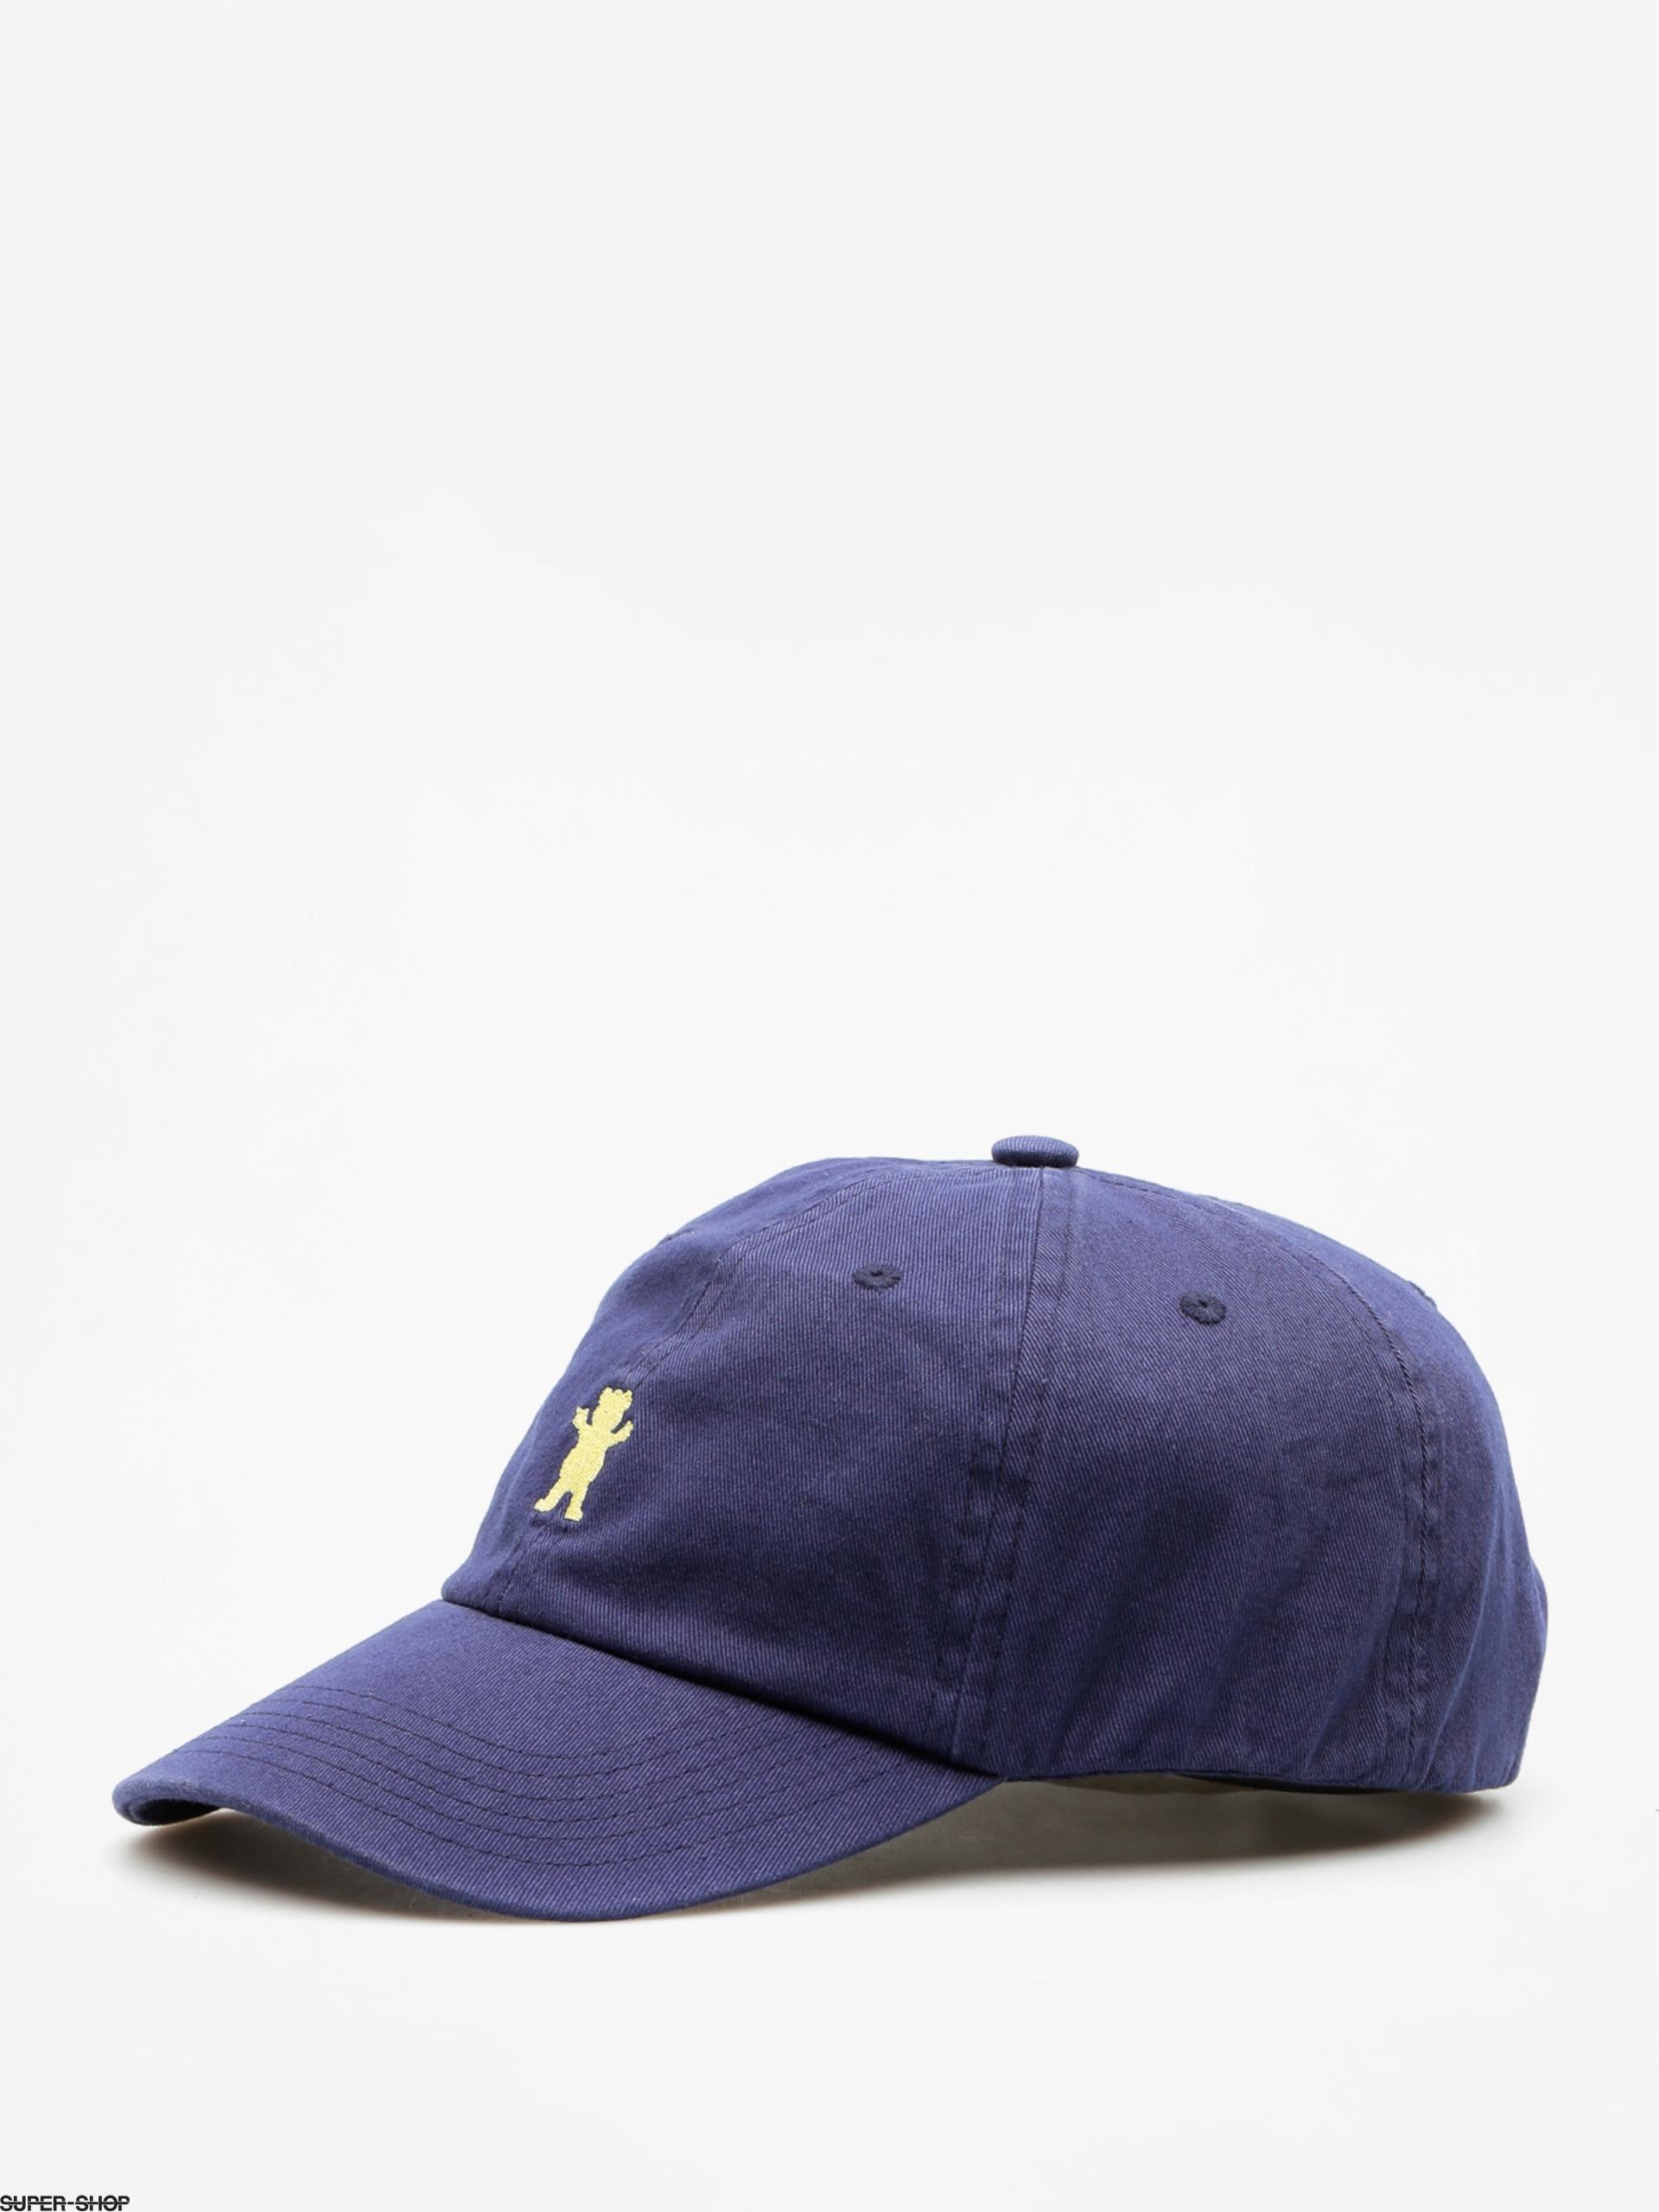 8207f349 Grizzly Griptape Cap Og Dad Bear Logo Hat (navy/yellow)